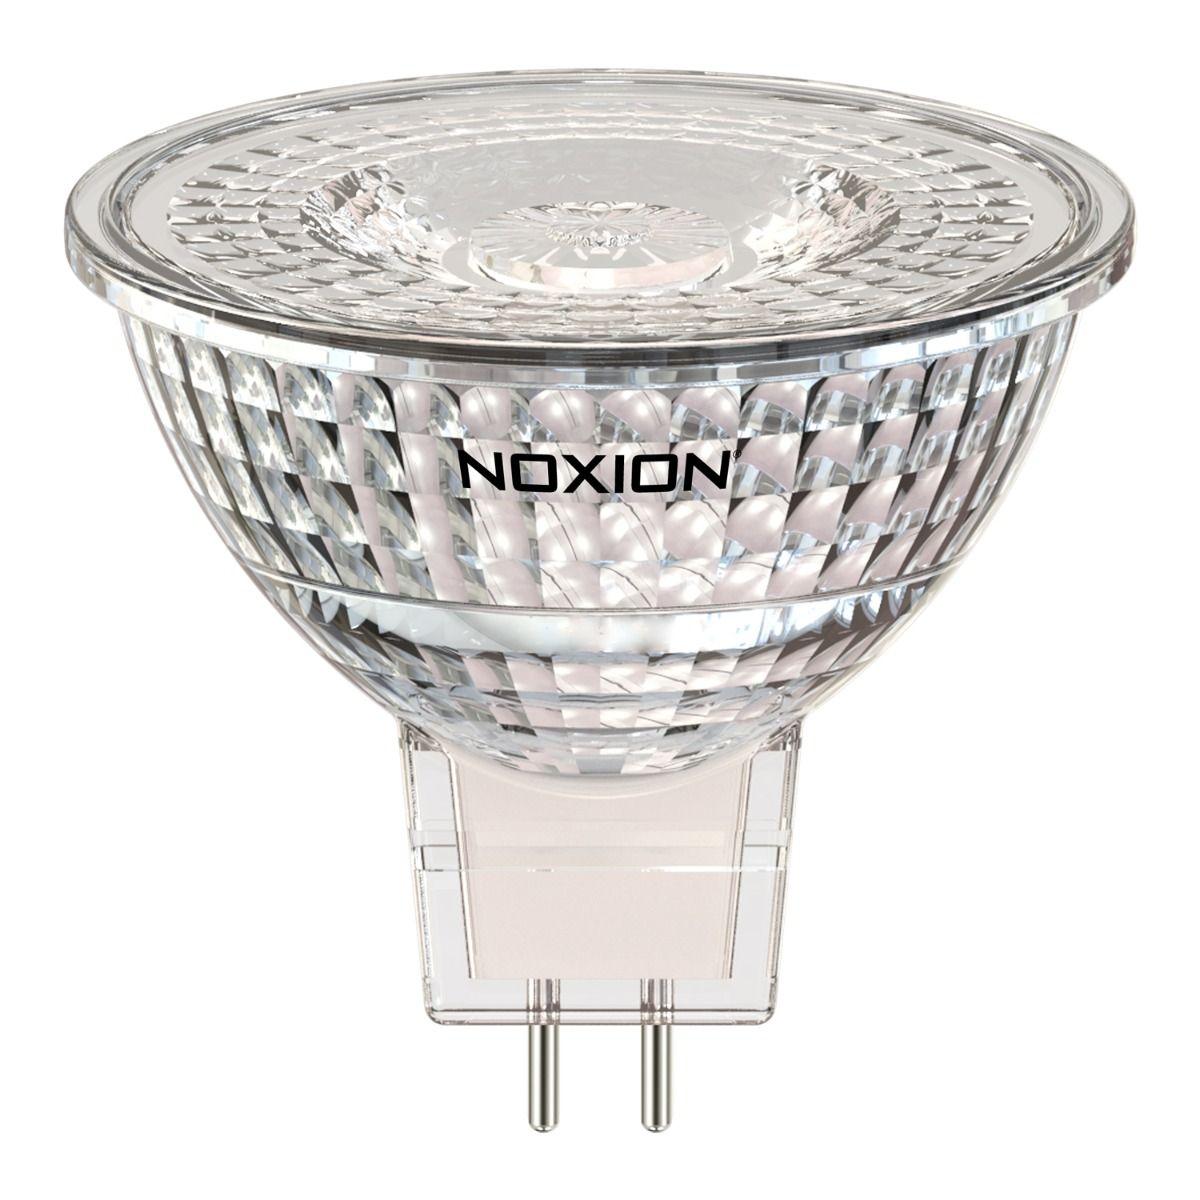 Noxion LED Spot GU5.3 4.5W 840 36D 410lm   Vervanger voor 35W